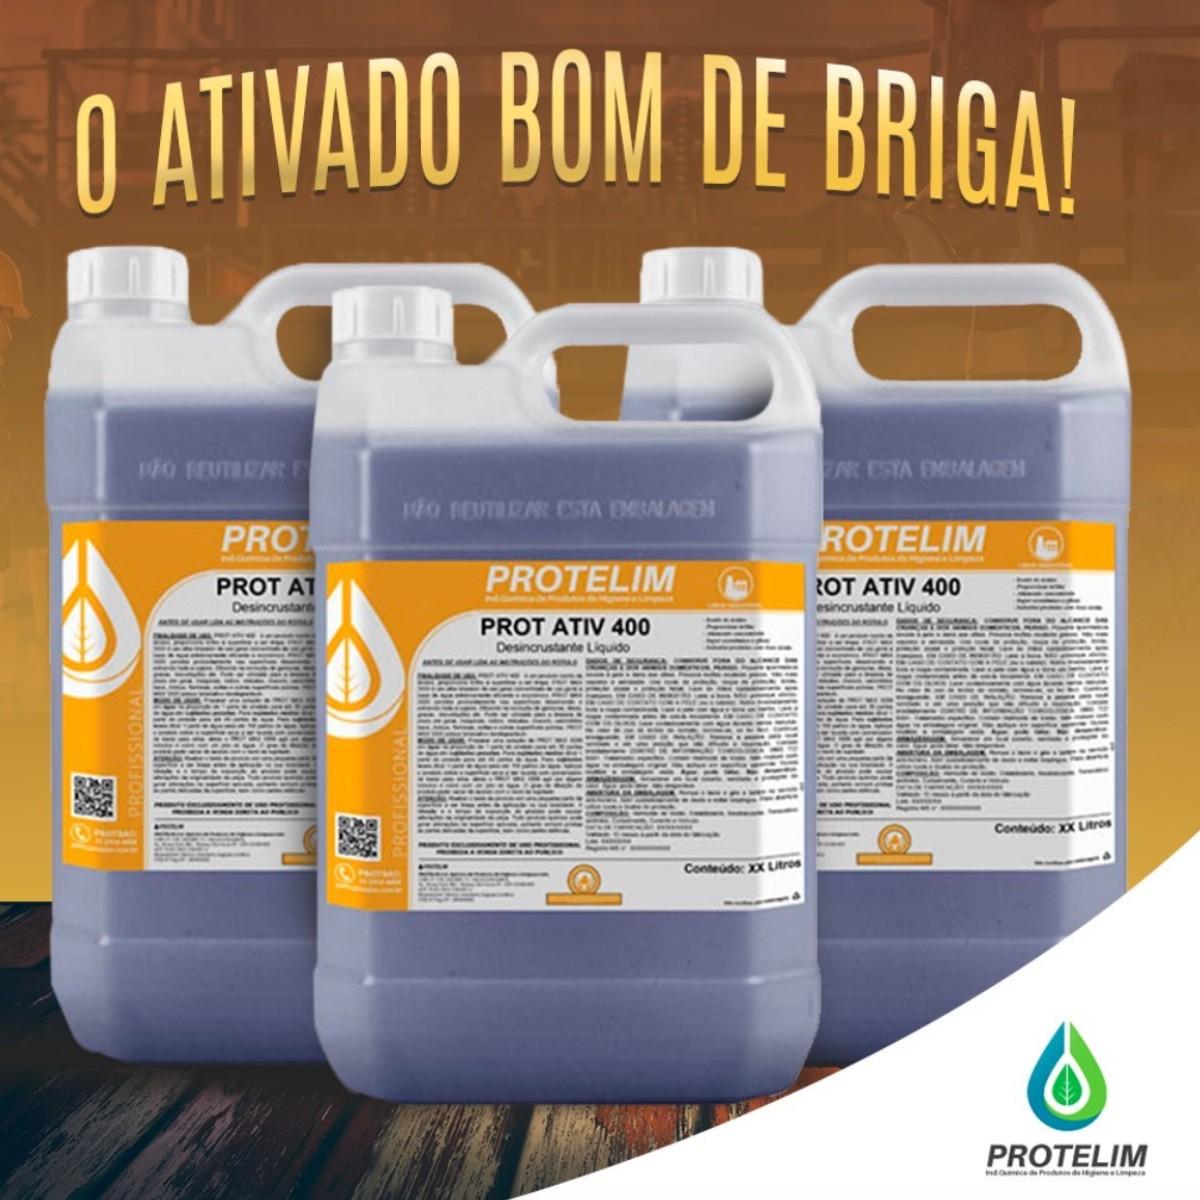 Detergente Desincrustante Ácido Limpa Baú Prot Ativ 400 5L